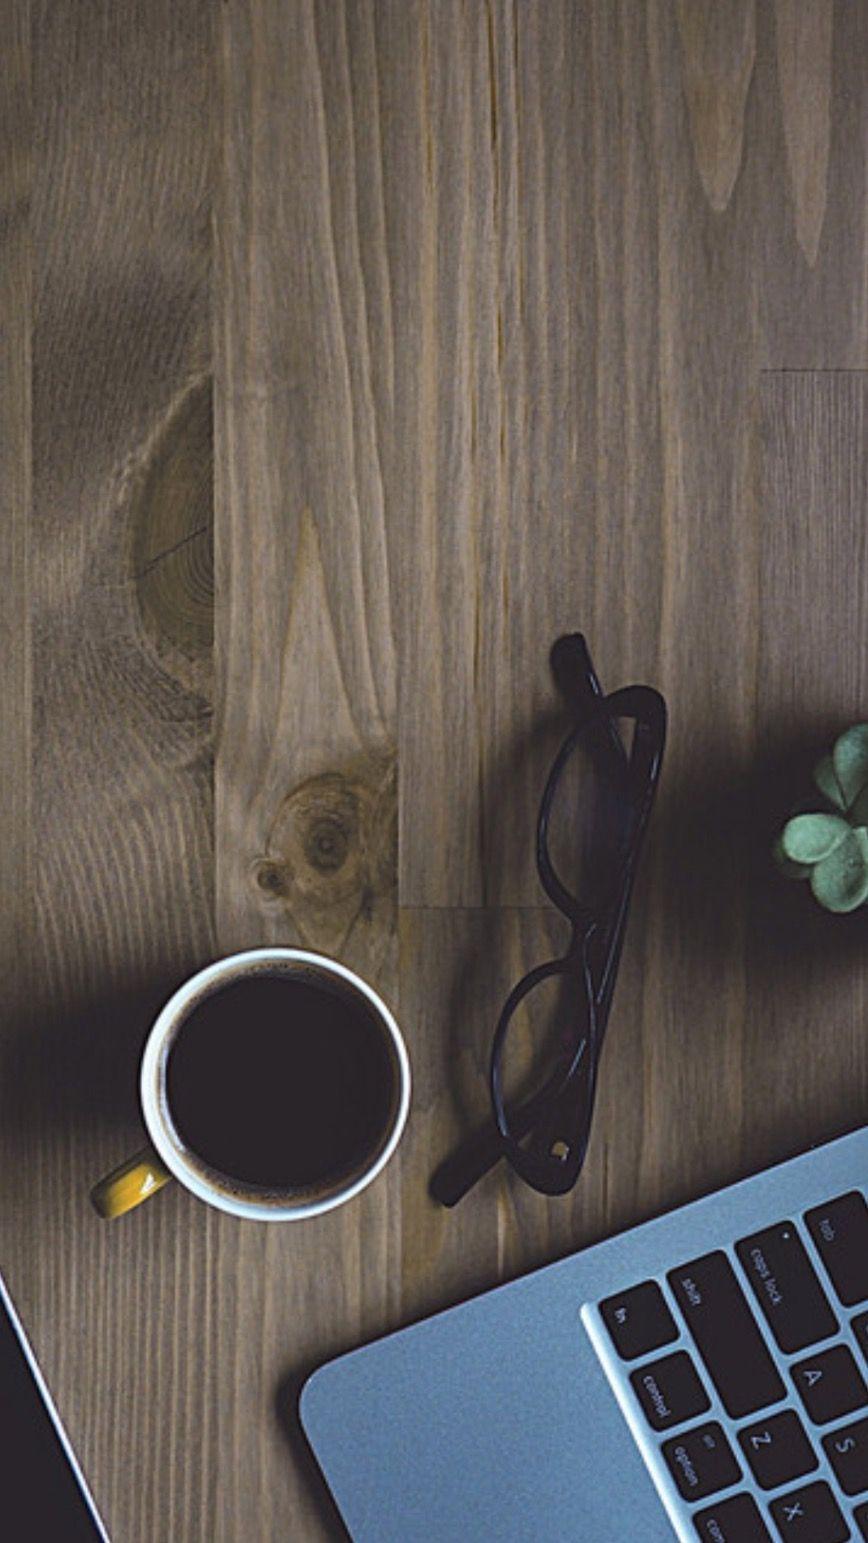 Pin On 4 Fondos Wallpaper tea cup book garlands leaves